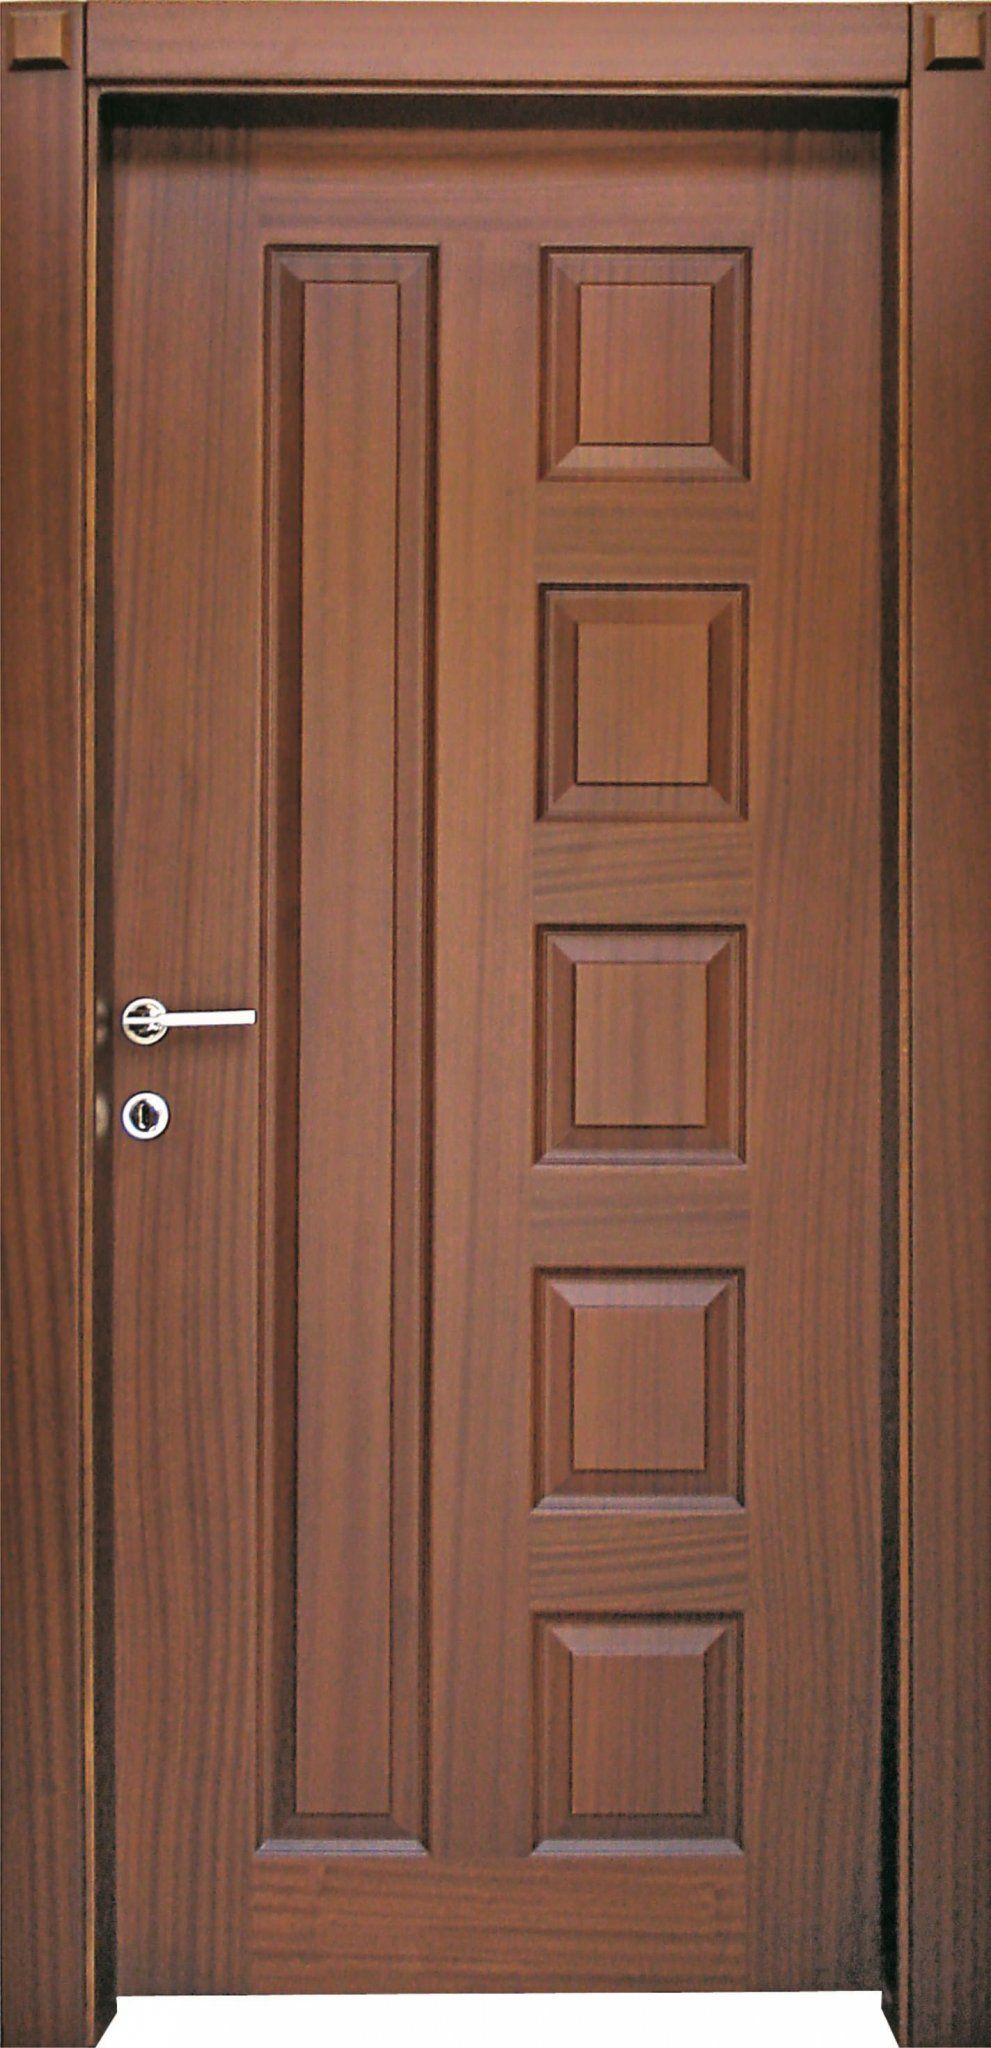 Top 50 Modern Wooden Door Design Ideas You Want To Choose ...